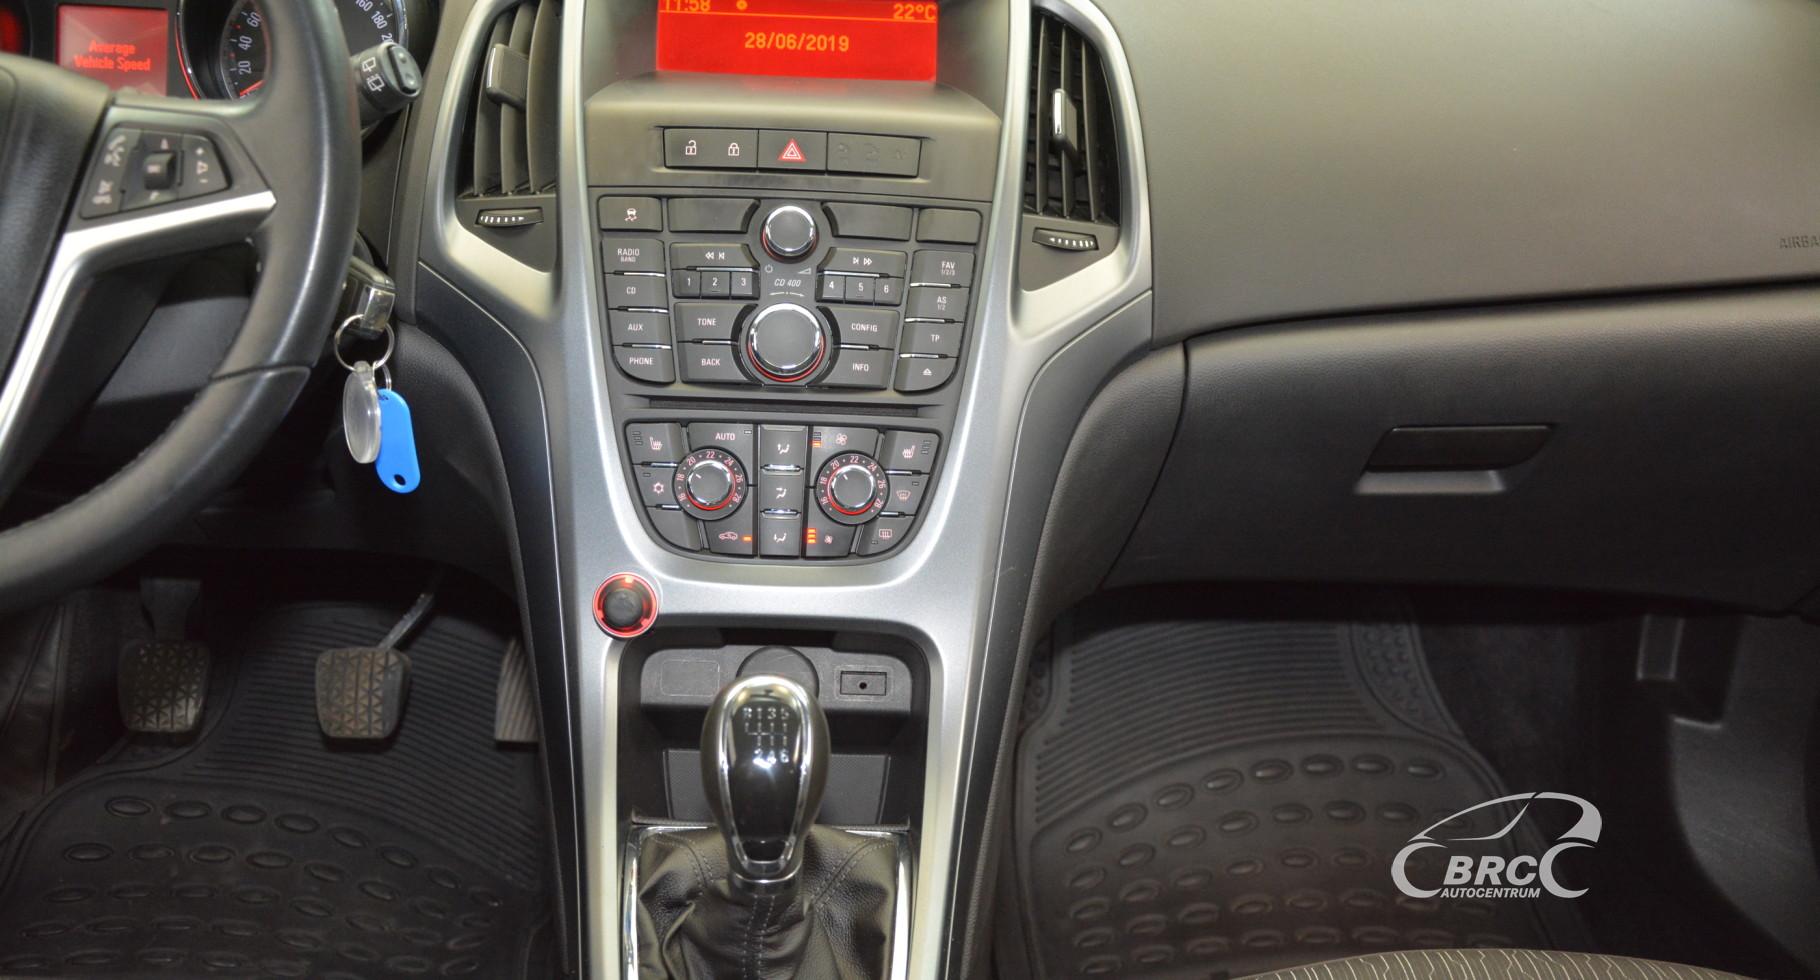 Opel Astra 1.7 CDTi Sports Tourer Enjoy